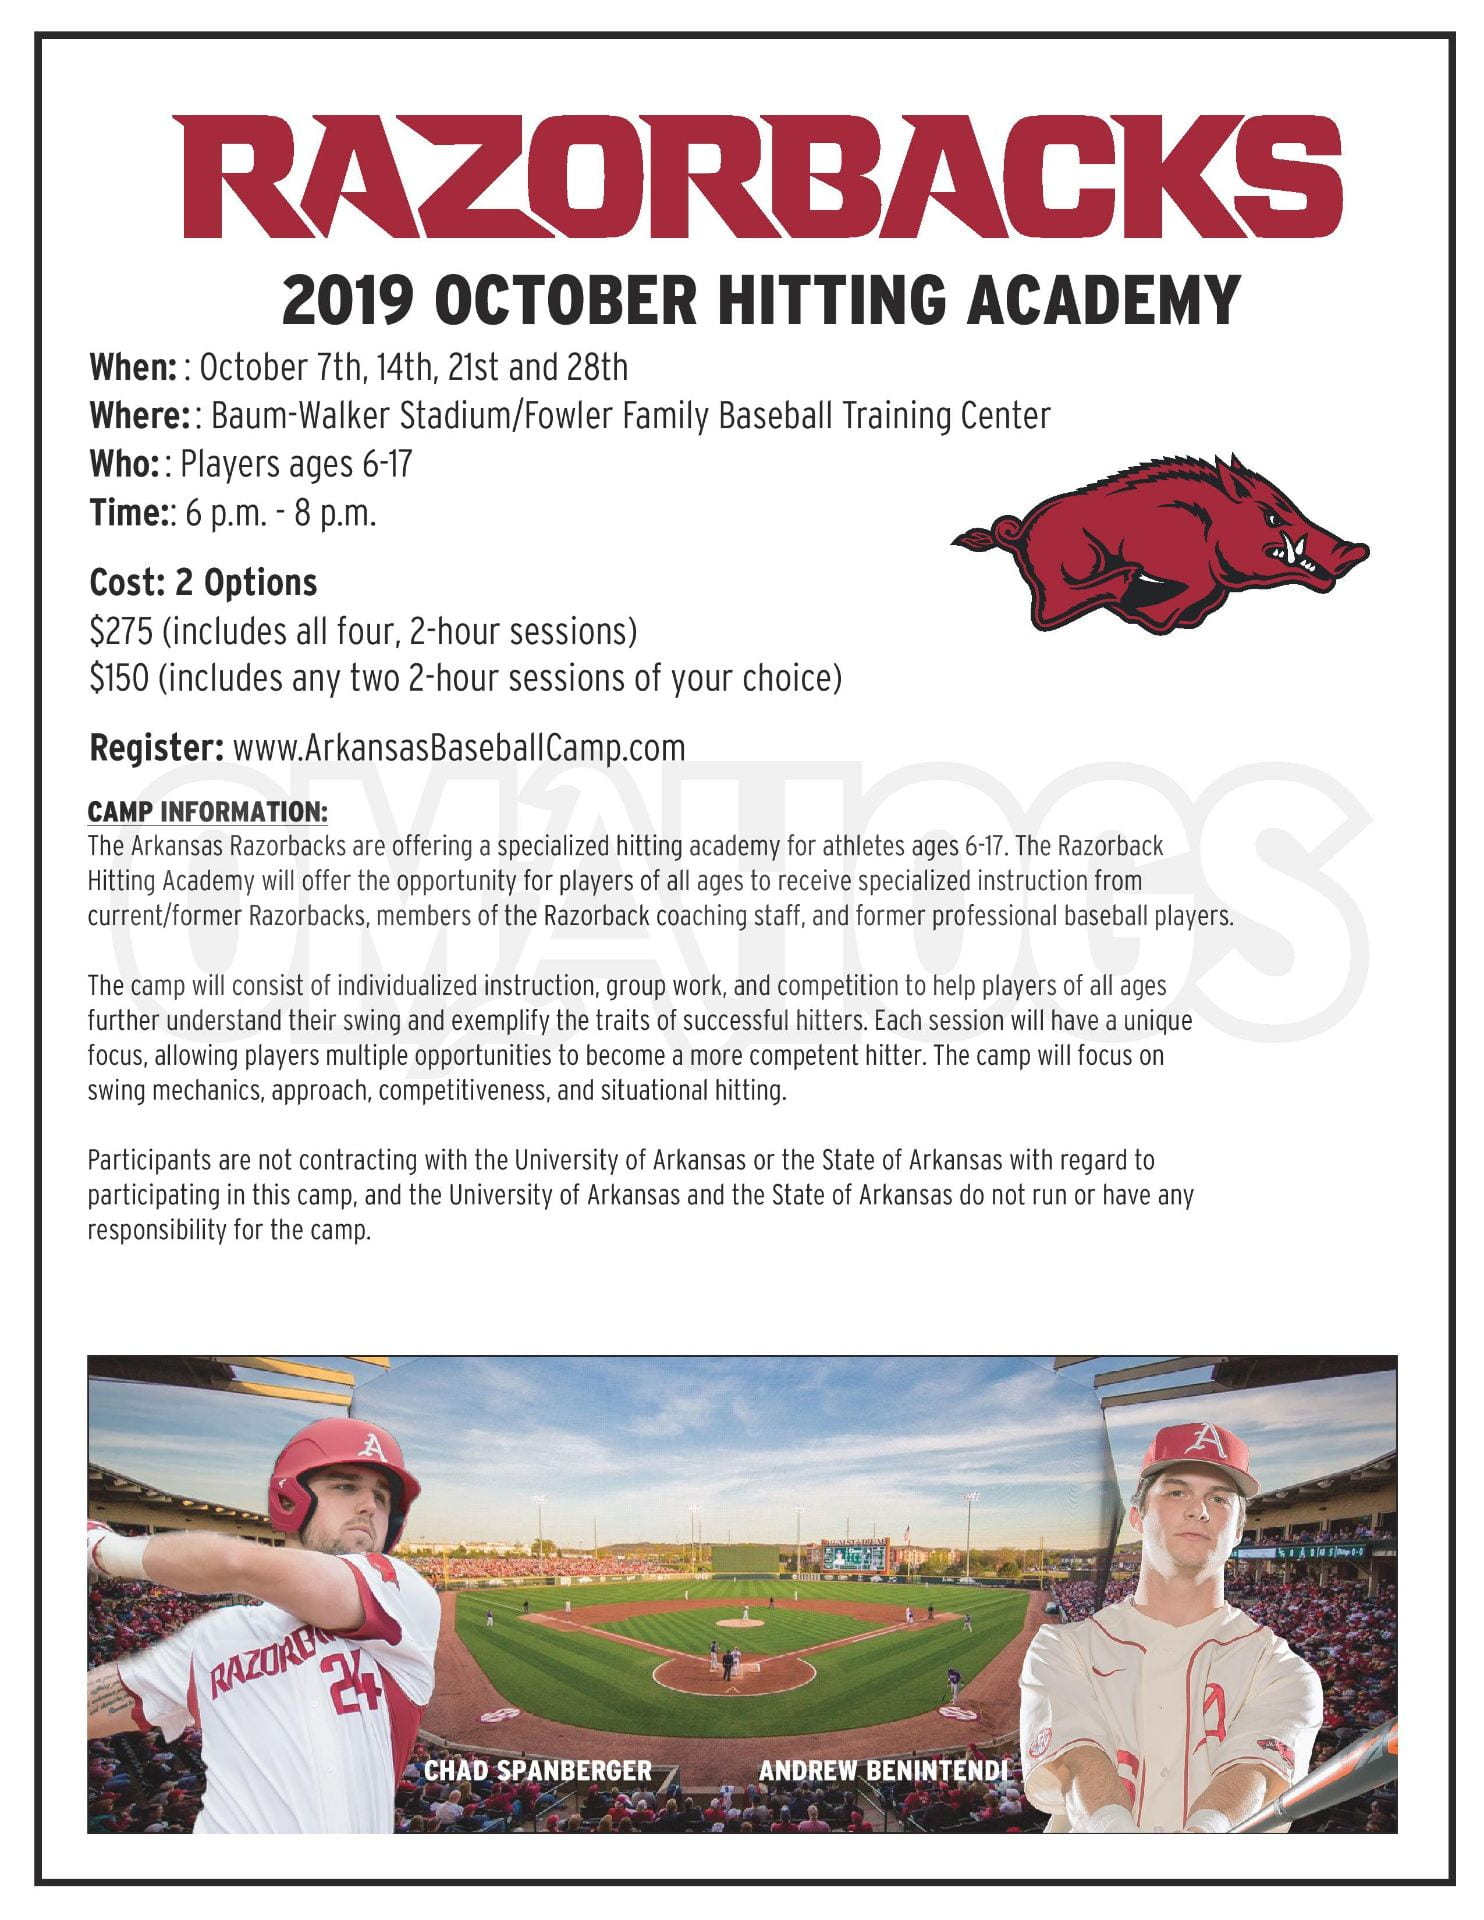 Arkansas Baseball Camps | Swinging for Excellence